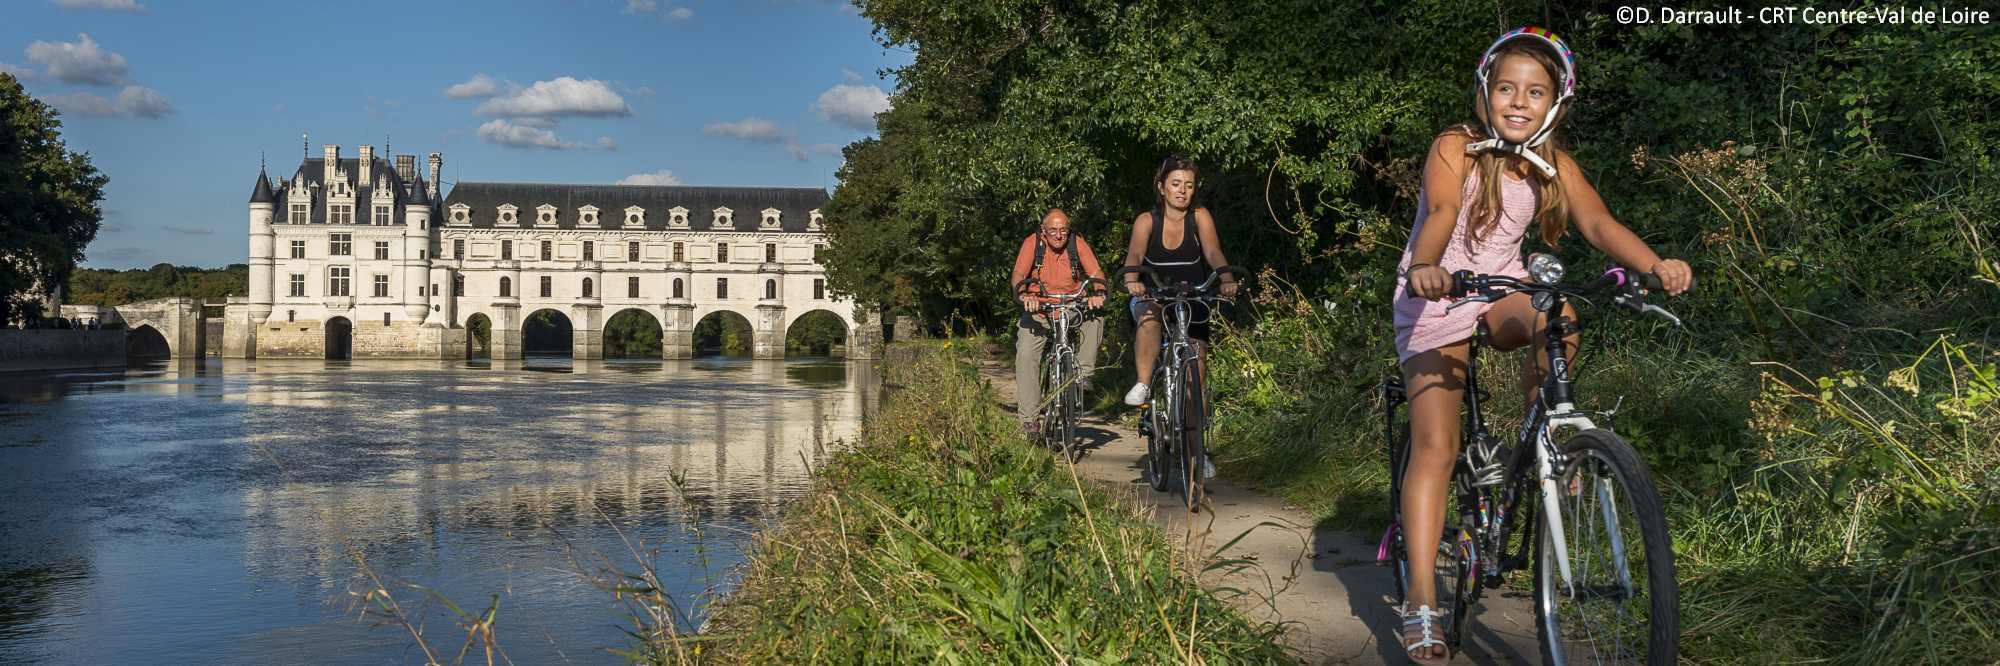 header foto fietsen langs de loire D. Darrault - CRT Centre-Val de Loire